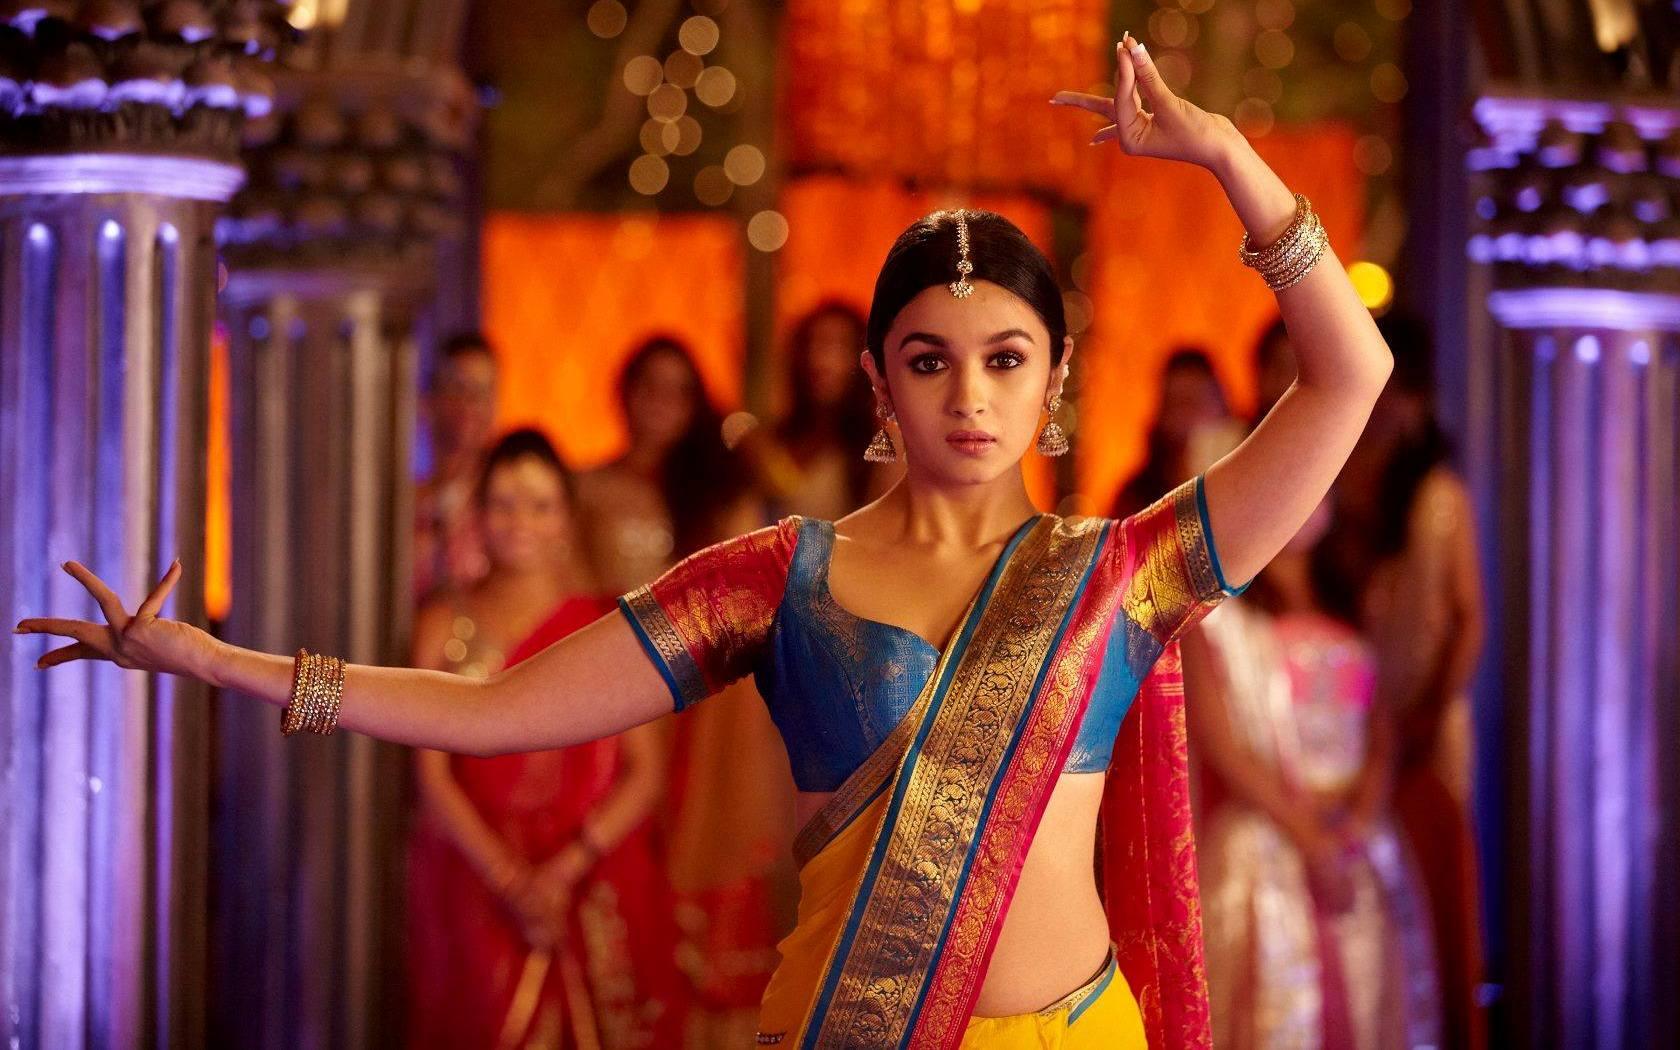 Alia Bhatt Dance In 2 States Movie Wallpapers